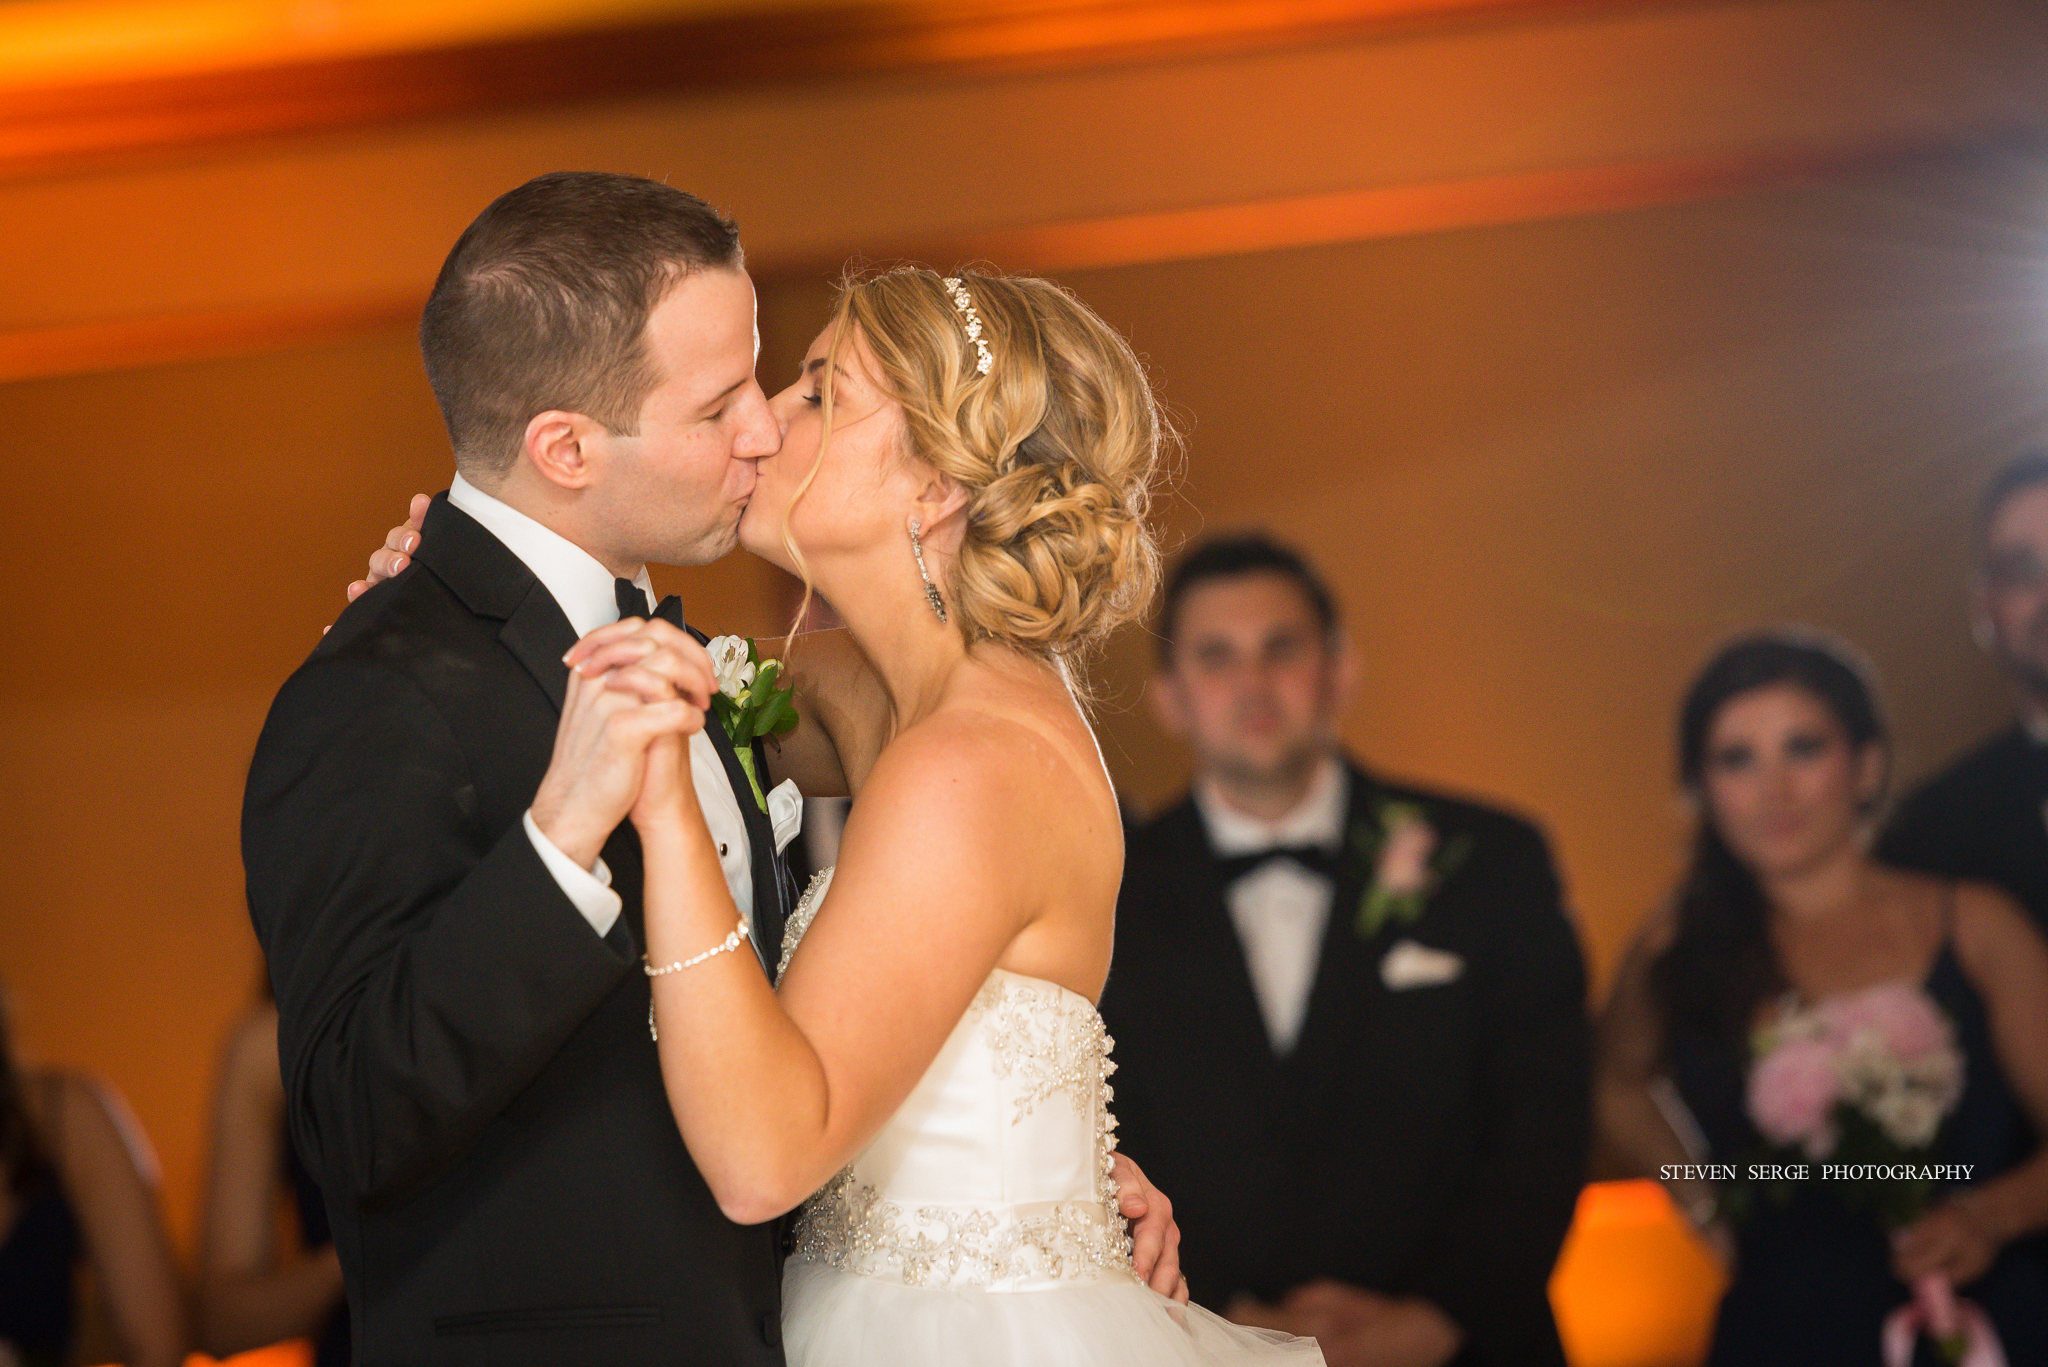 scranton-wedding-photographers-hilton-steven-serge-photography-13.jpg